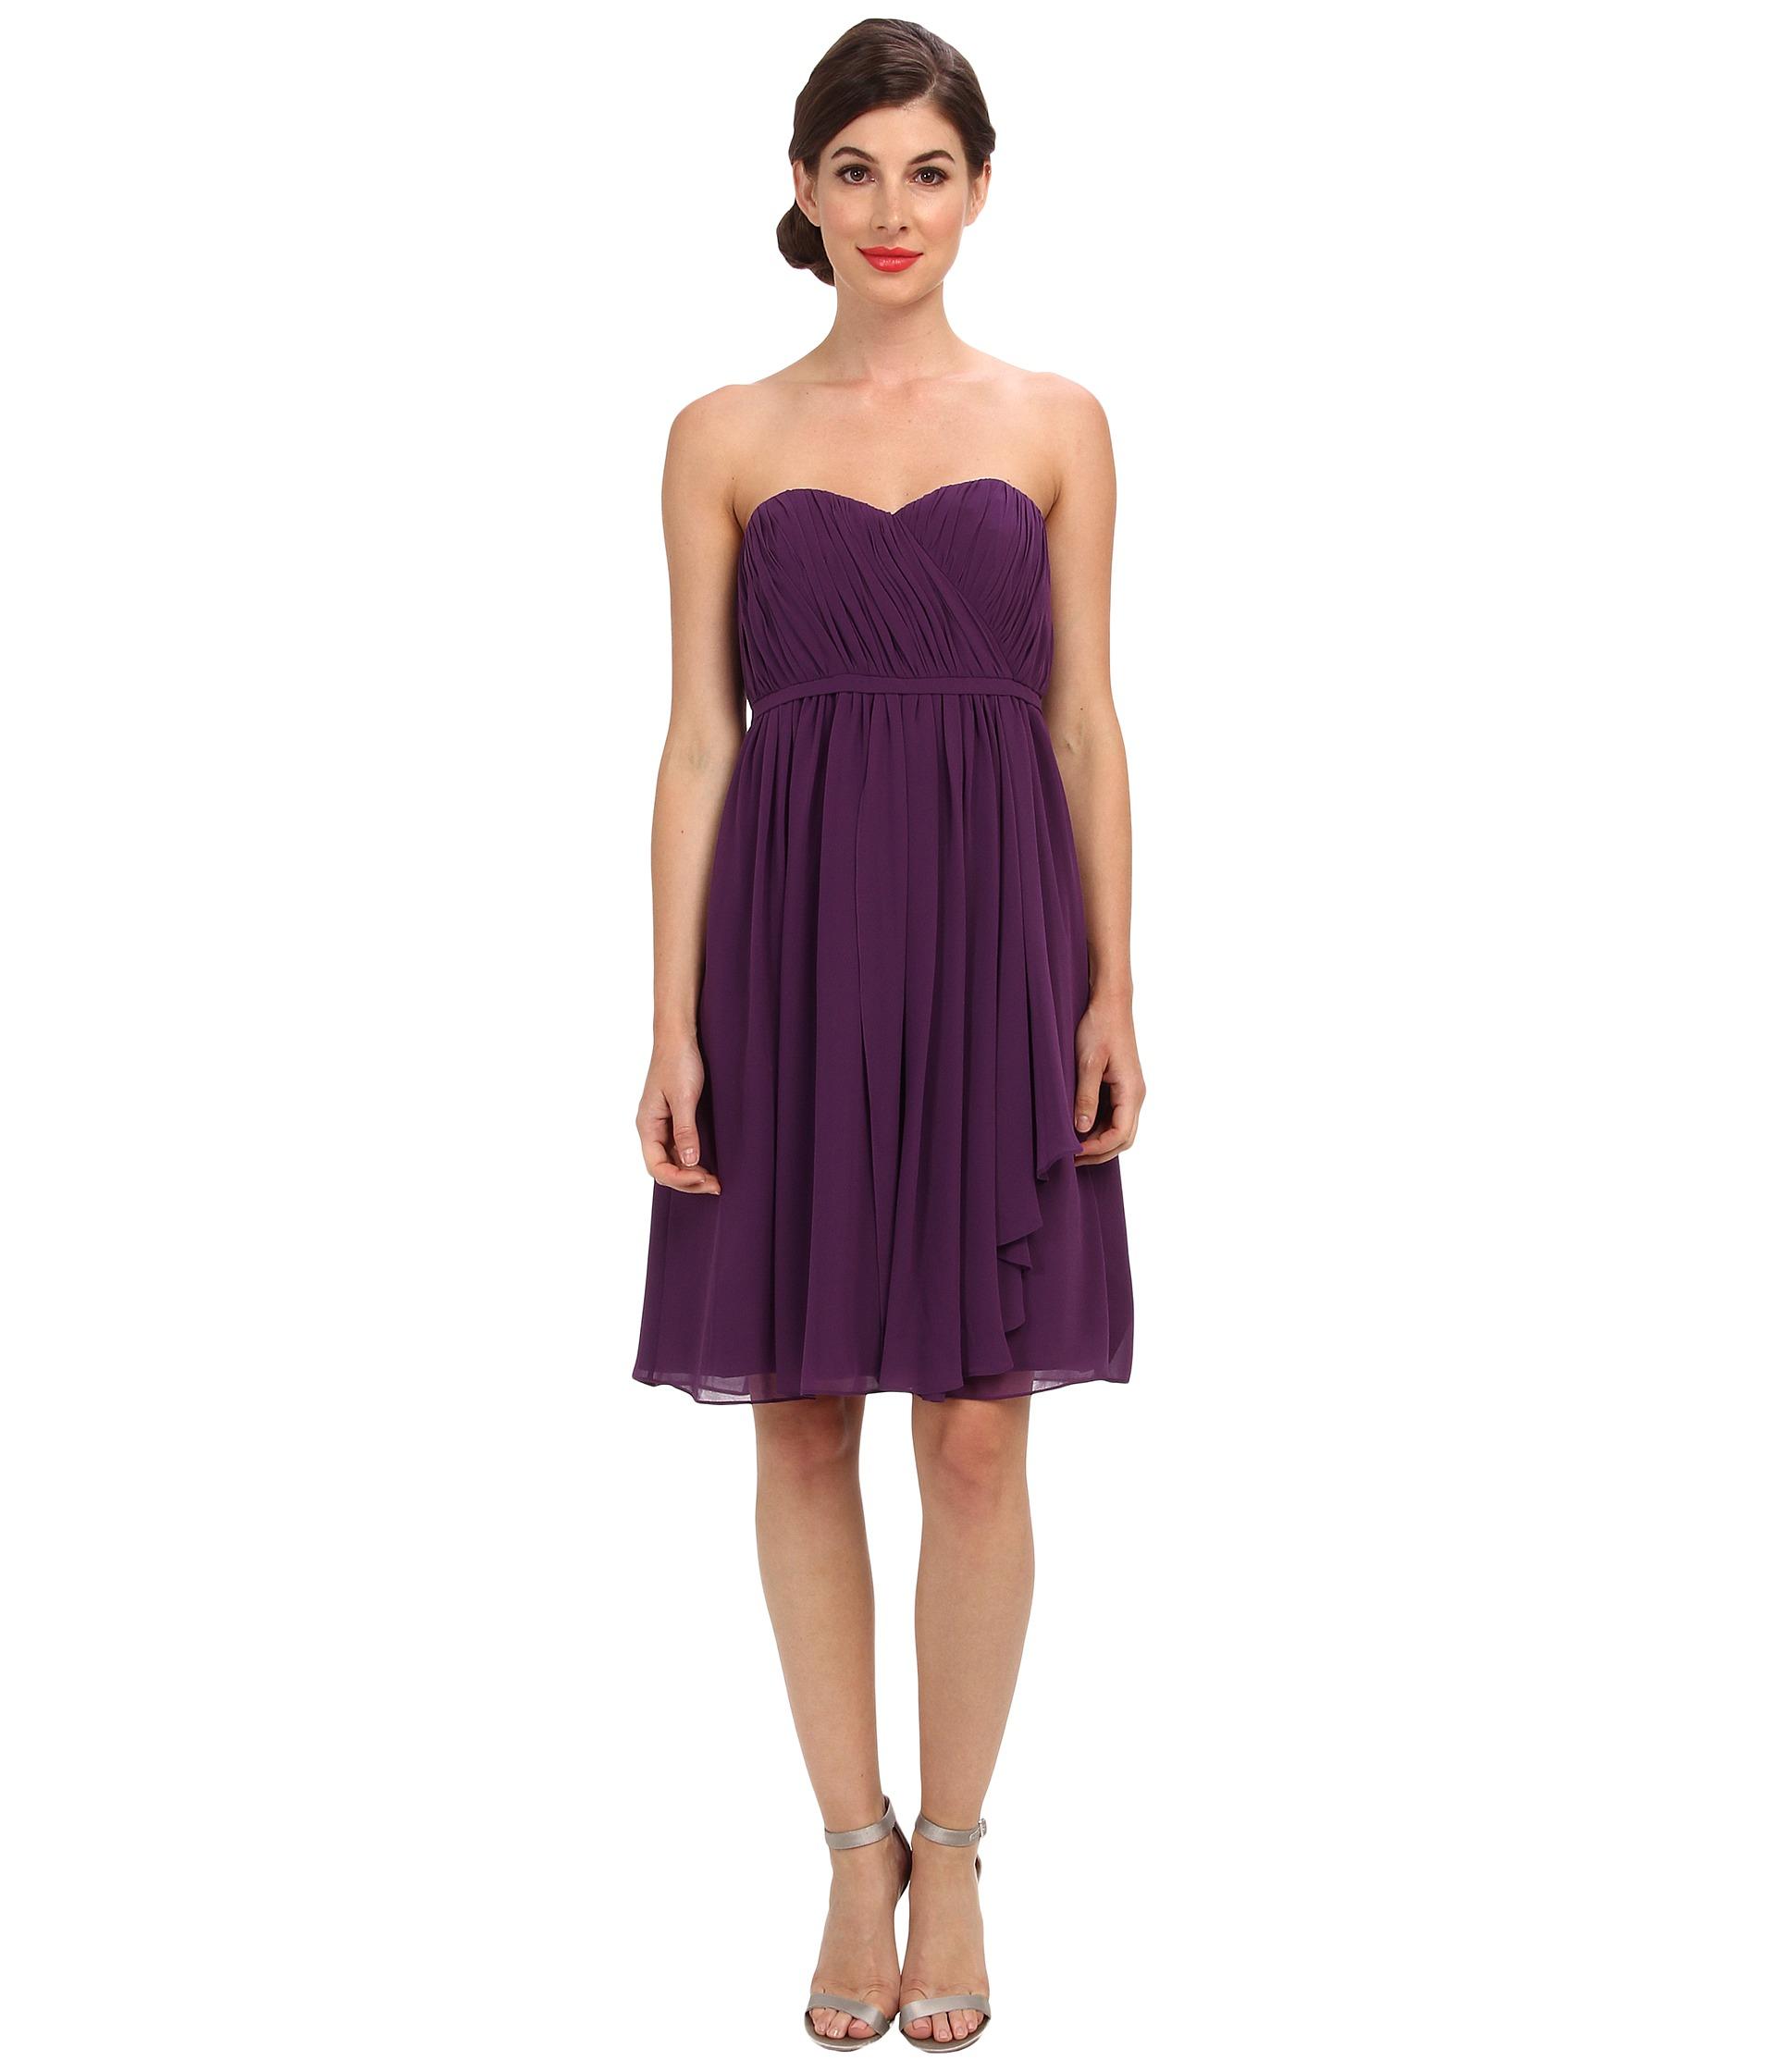 Donna morgan Lindsey Strapless Chiffon Dress in Purple | Lyst